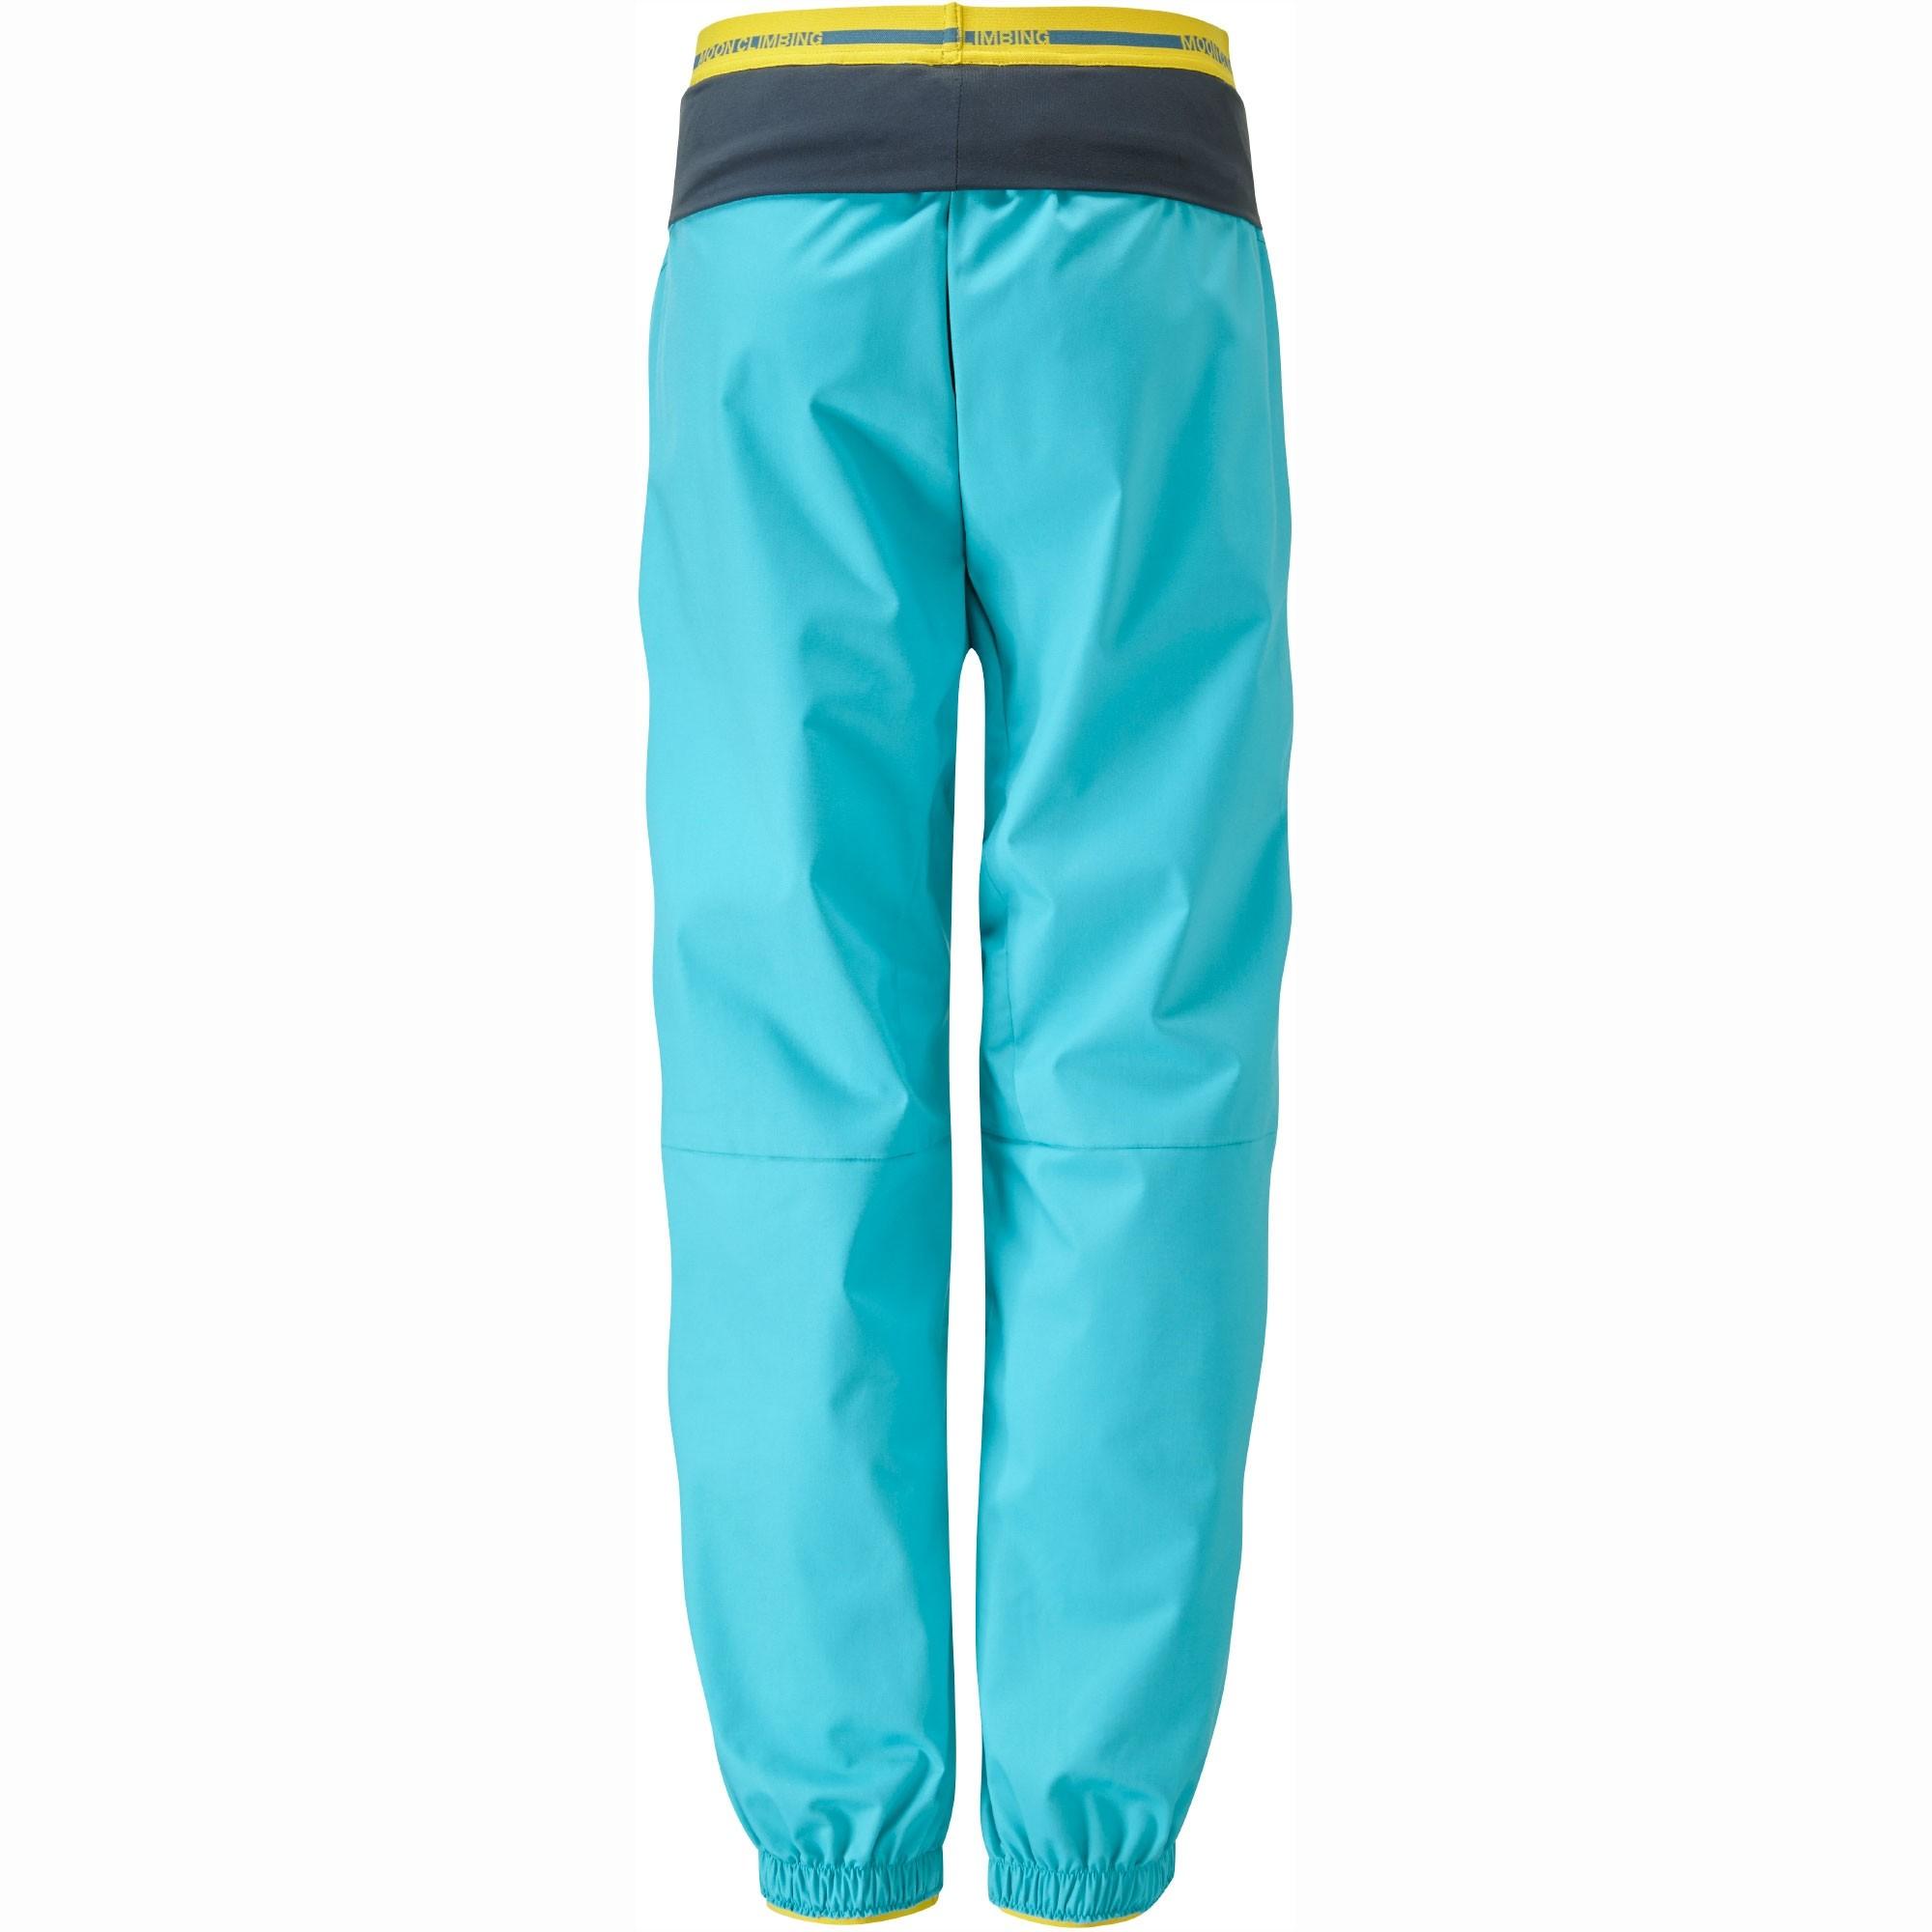 Moon Women's Samurai Pants - Bluebird - Back